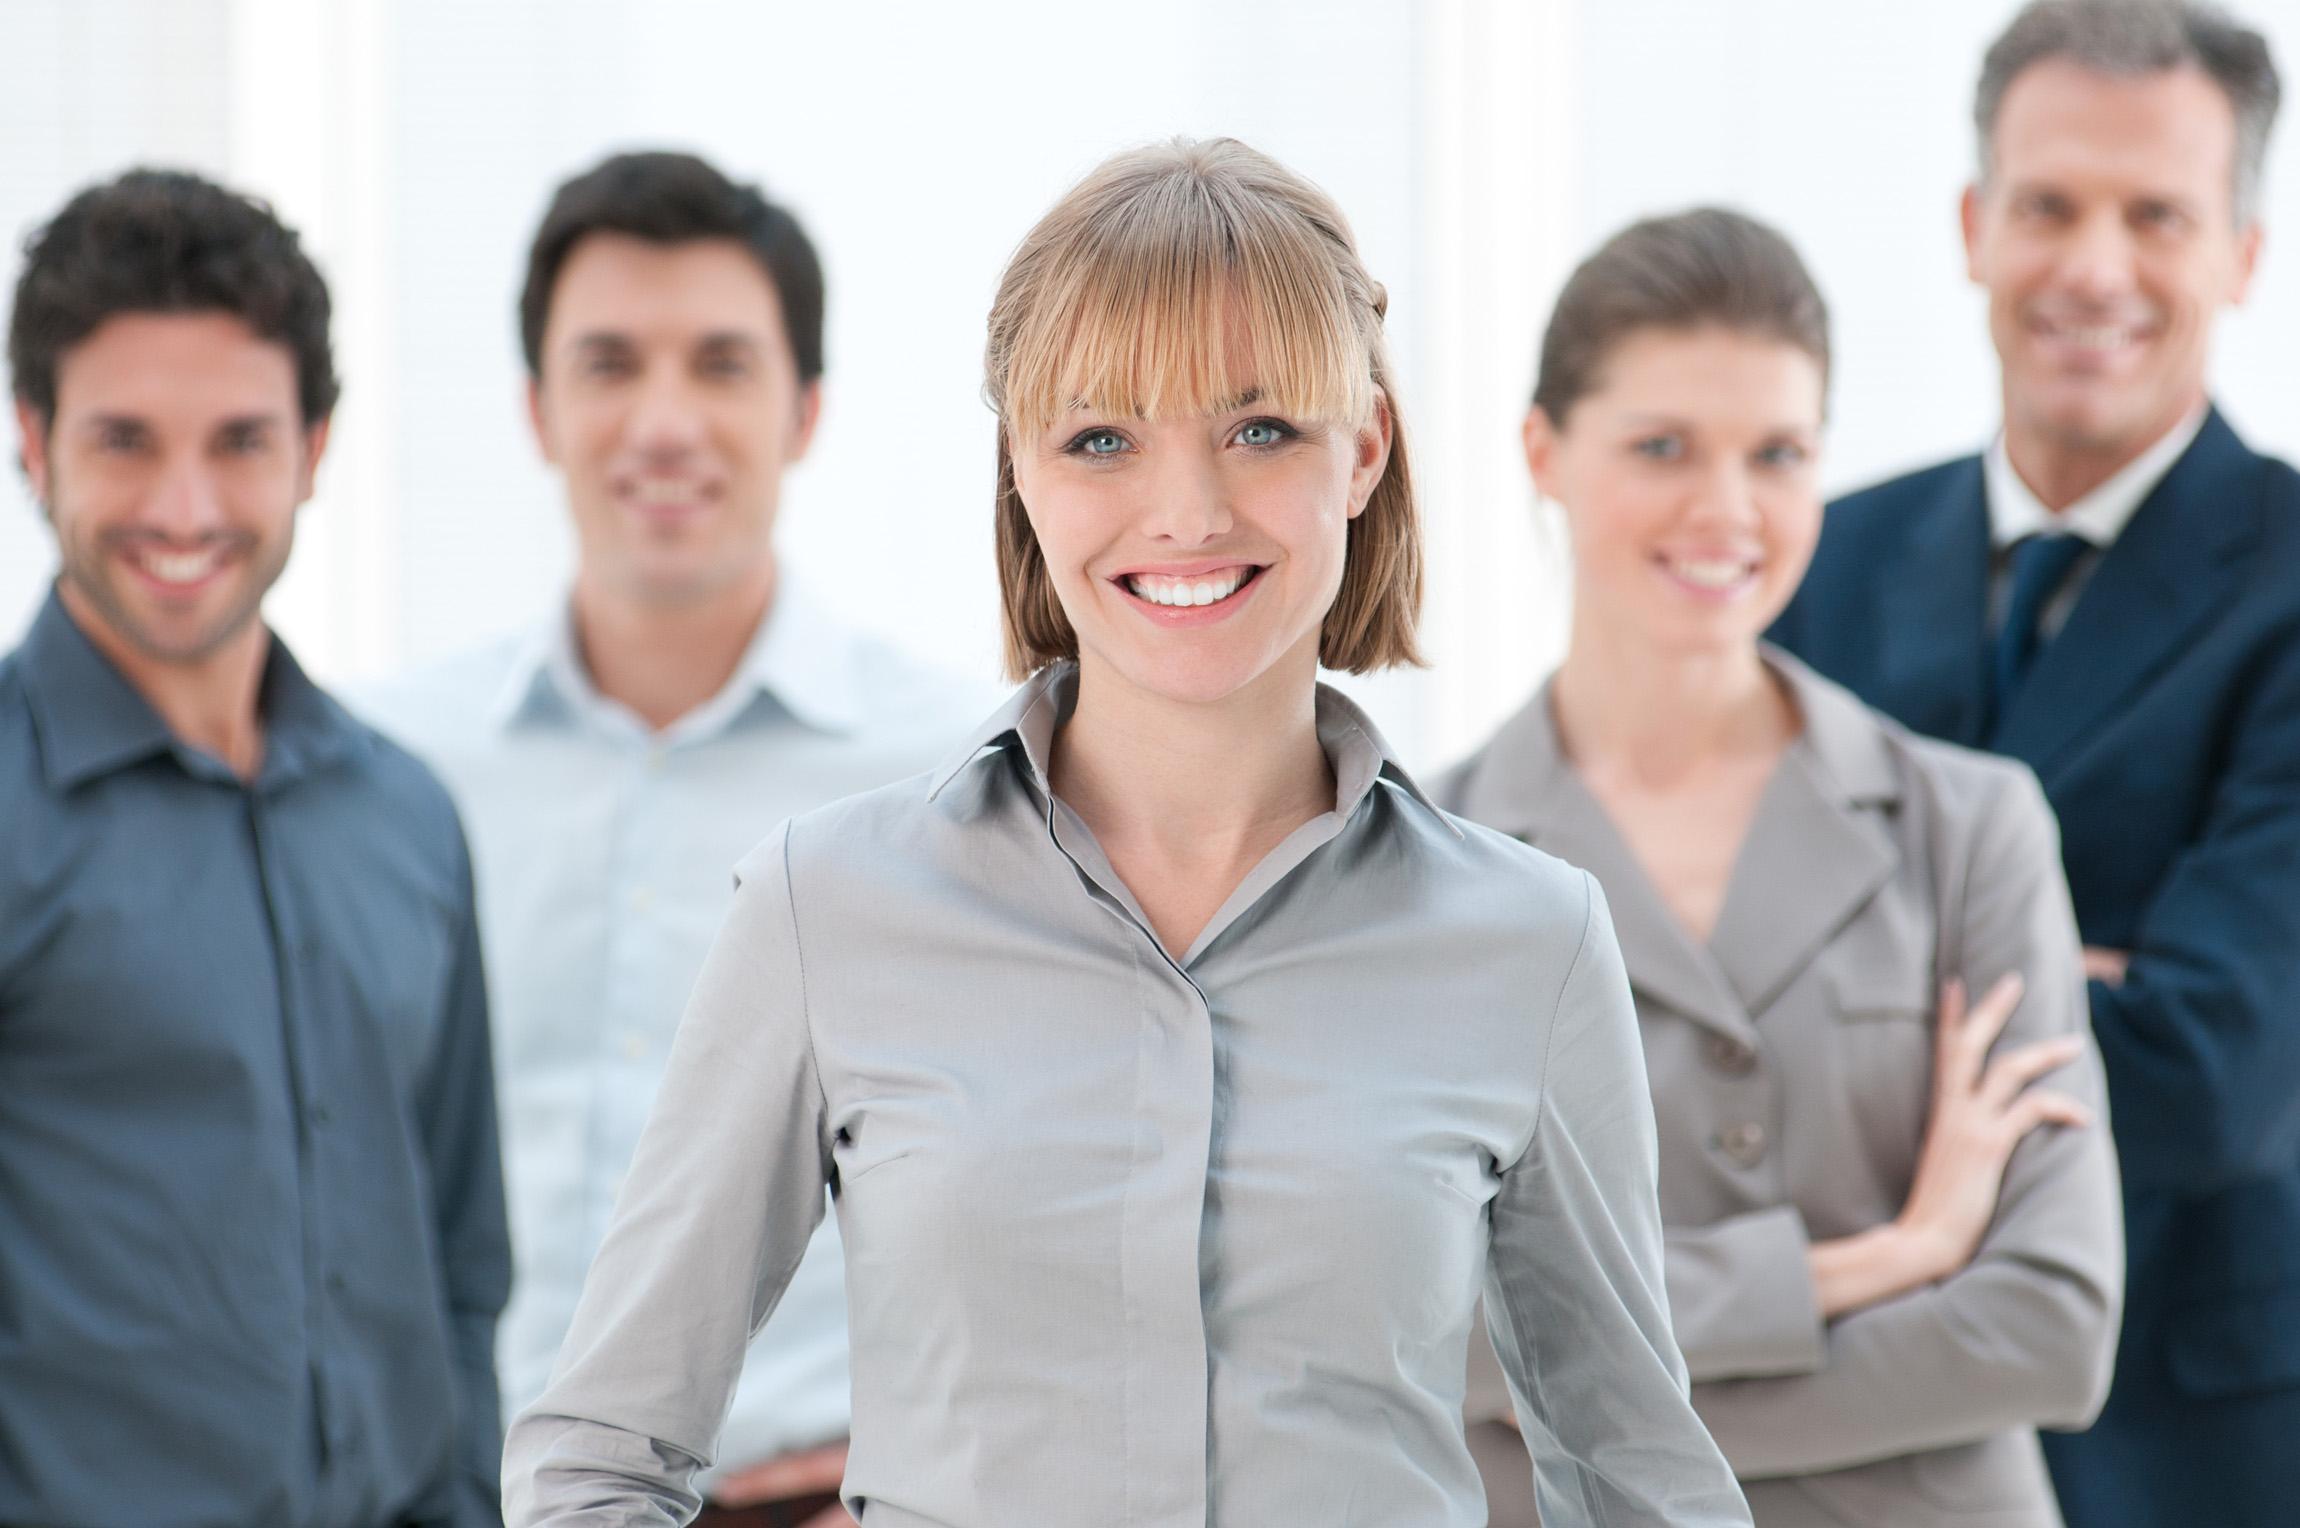 Detalhes - Seguro de Vida Empresarial Vida em Grupo Icatu